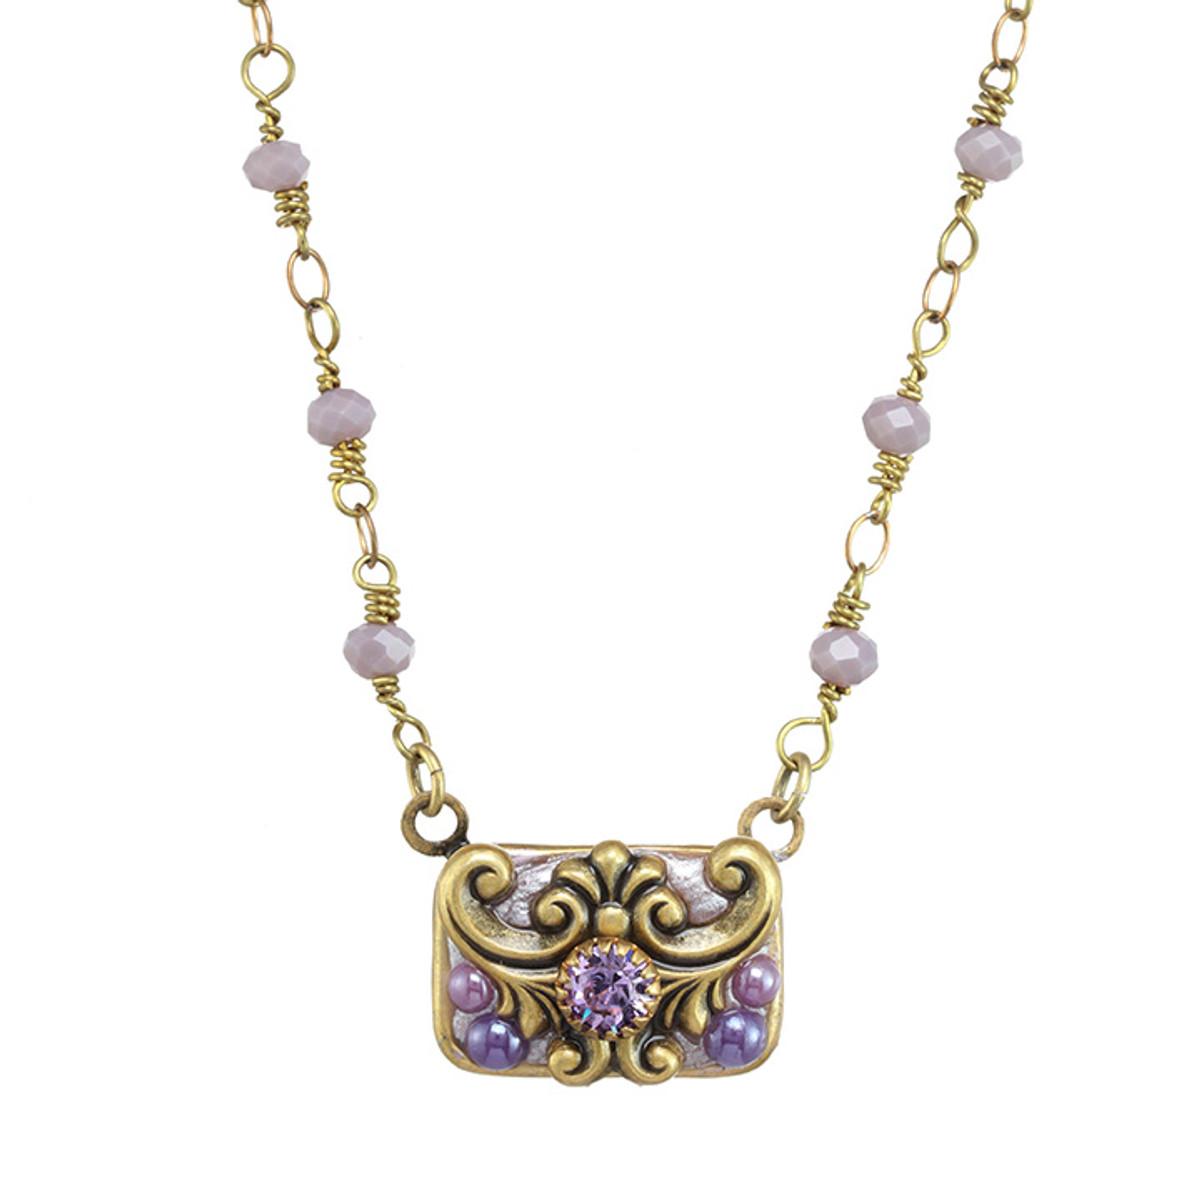 Michal Golan Michal Golan Lilac Rectangle Necklace